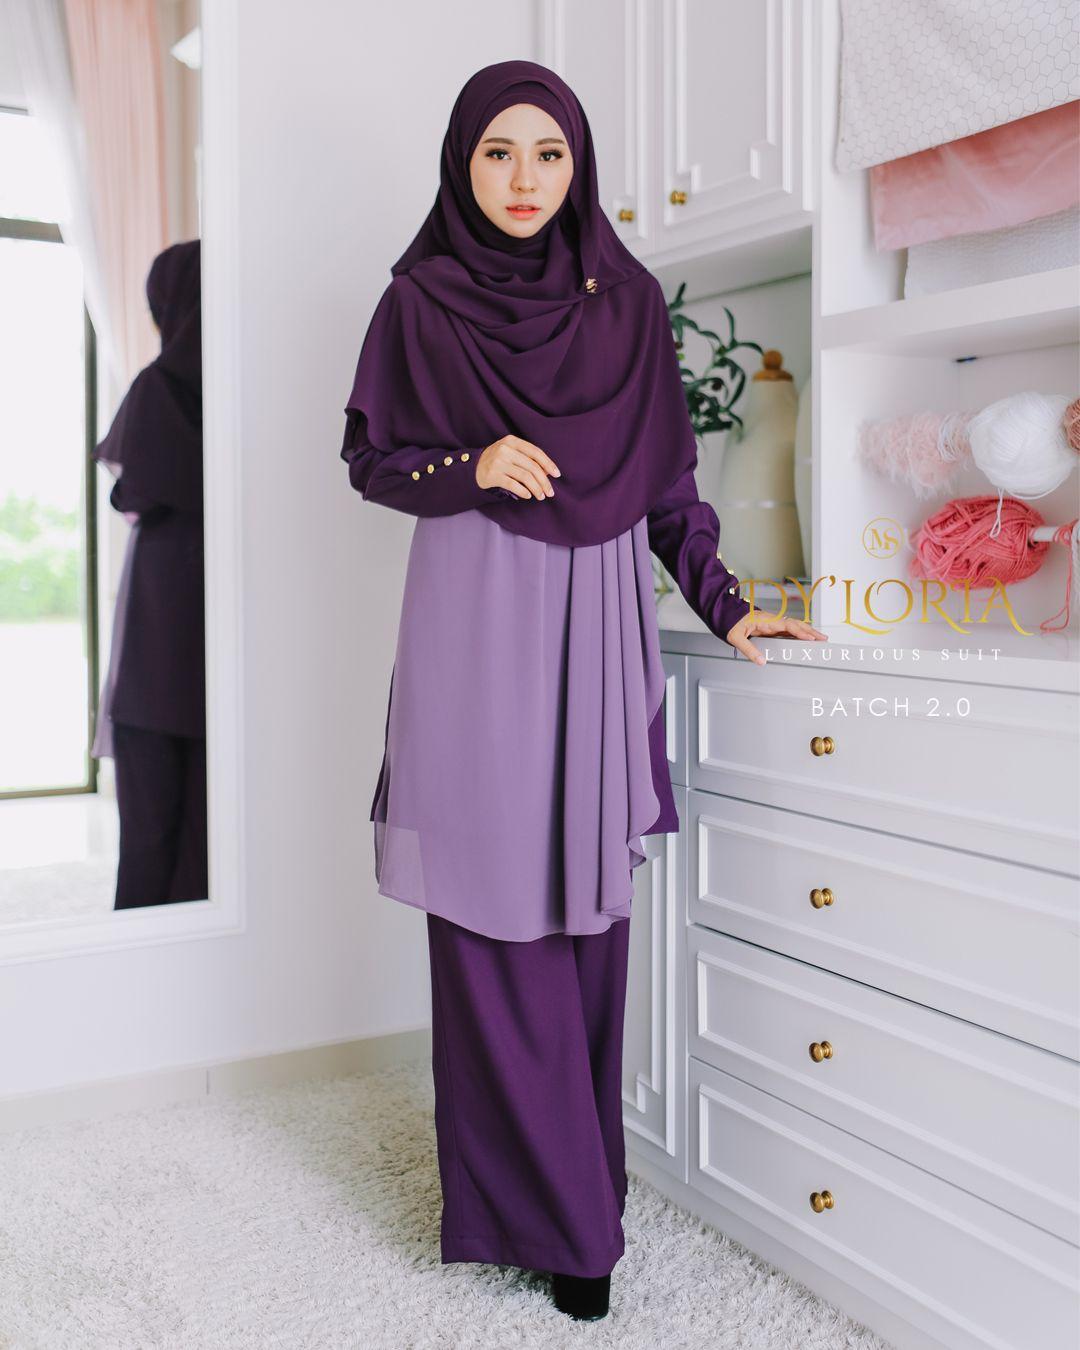 RM 179.00 Lavender Fashion, Shopee malaysia, Shopping